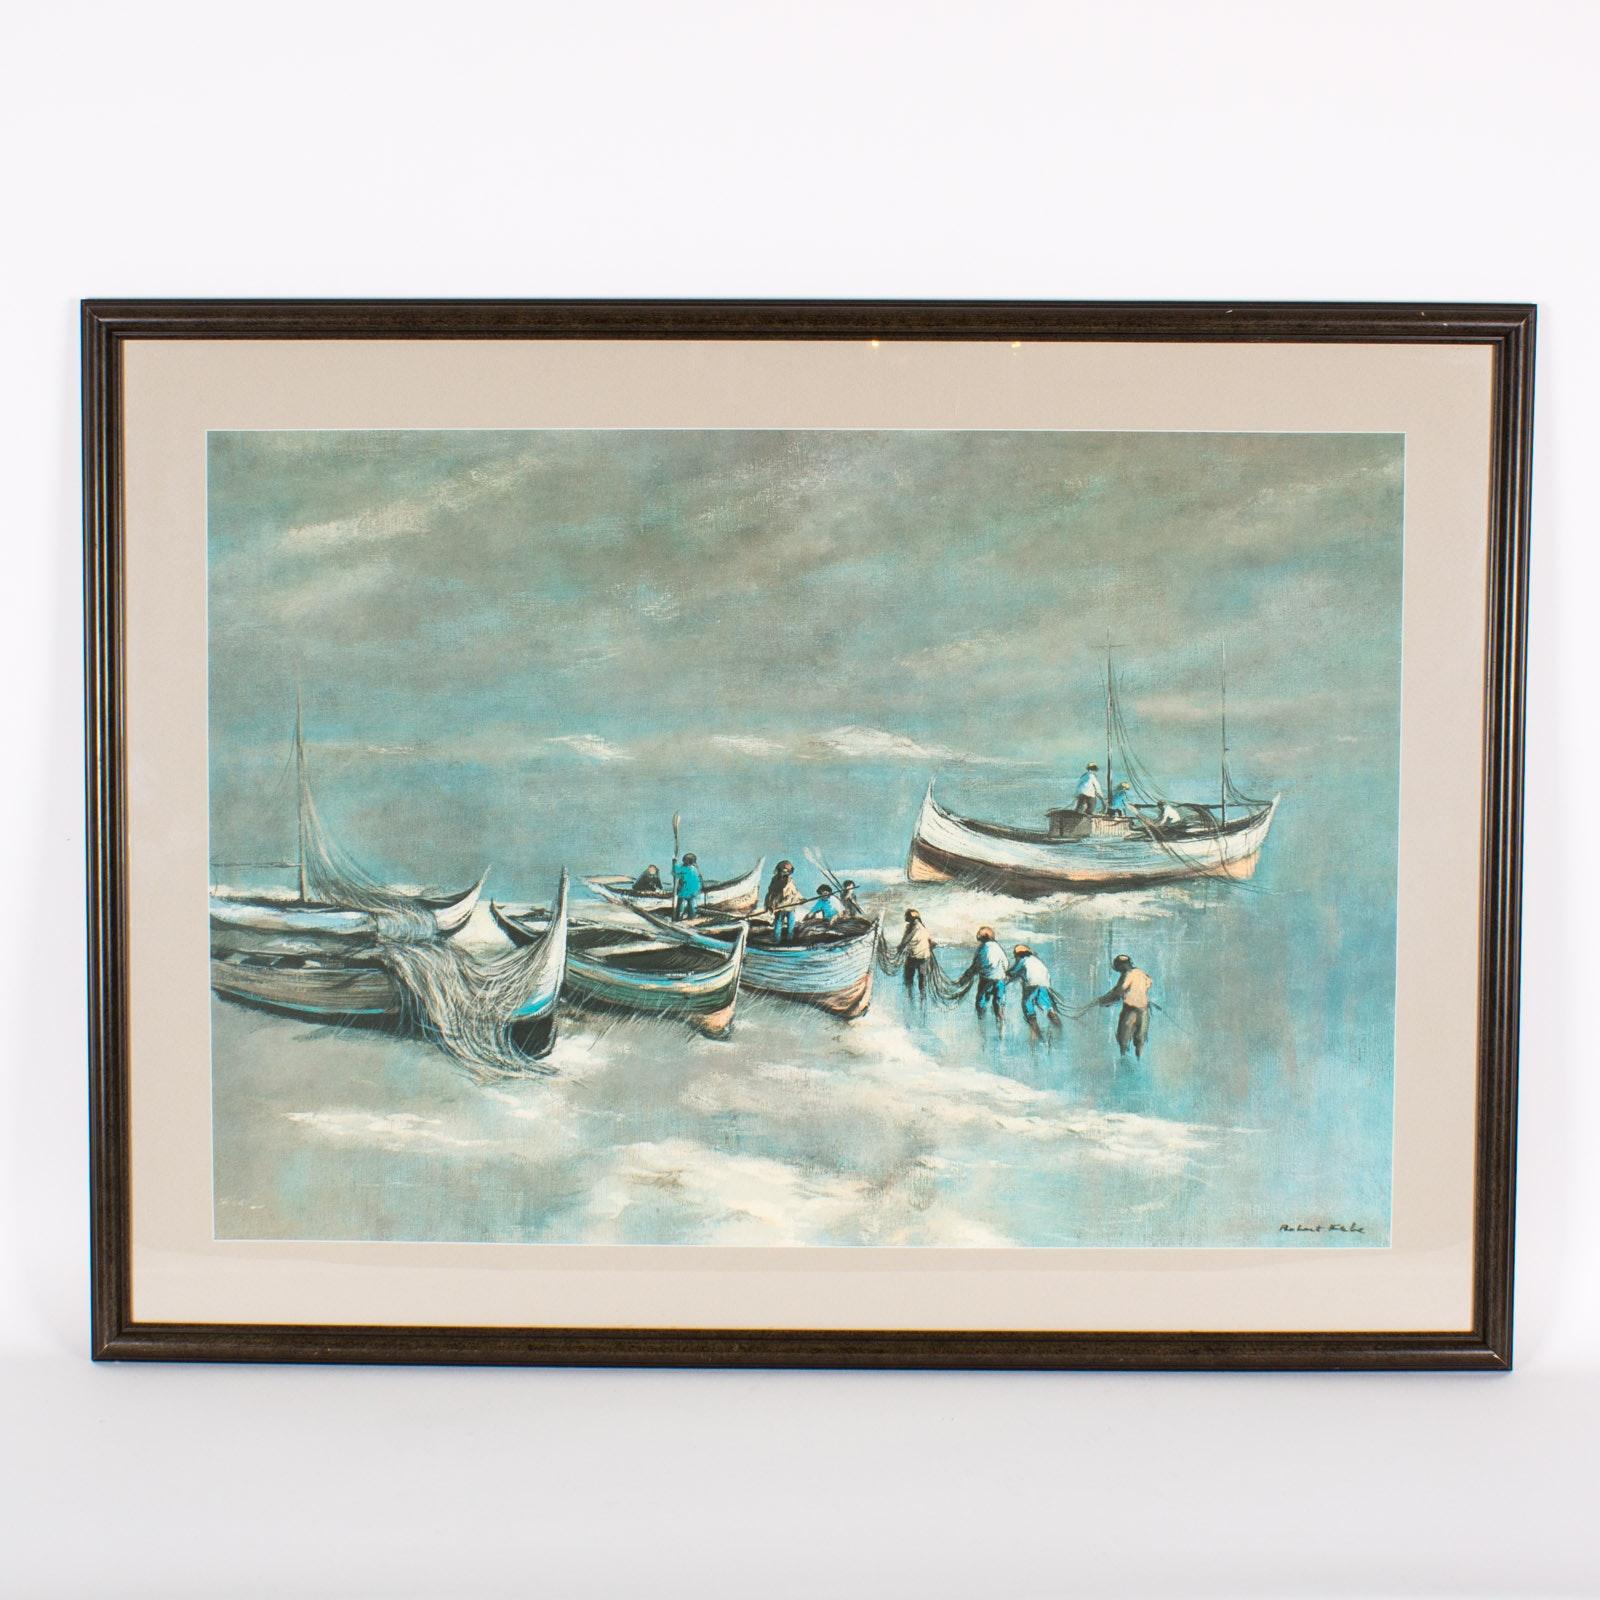 Robert Fabe Original Signed Watercolor Painting